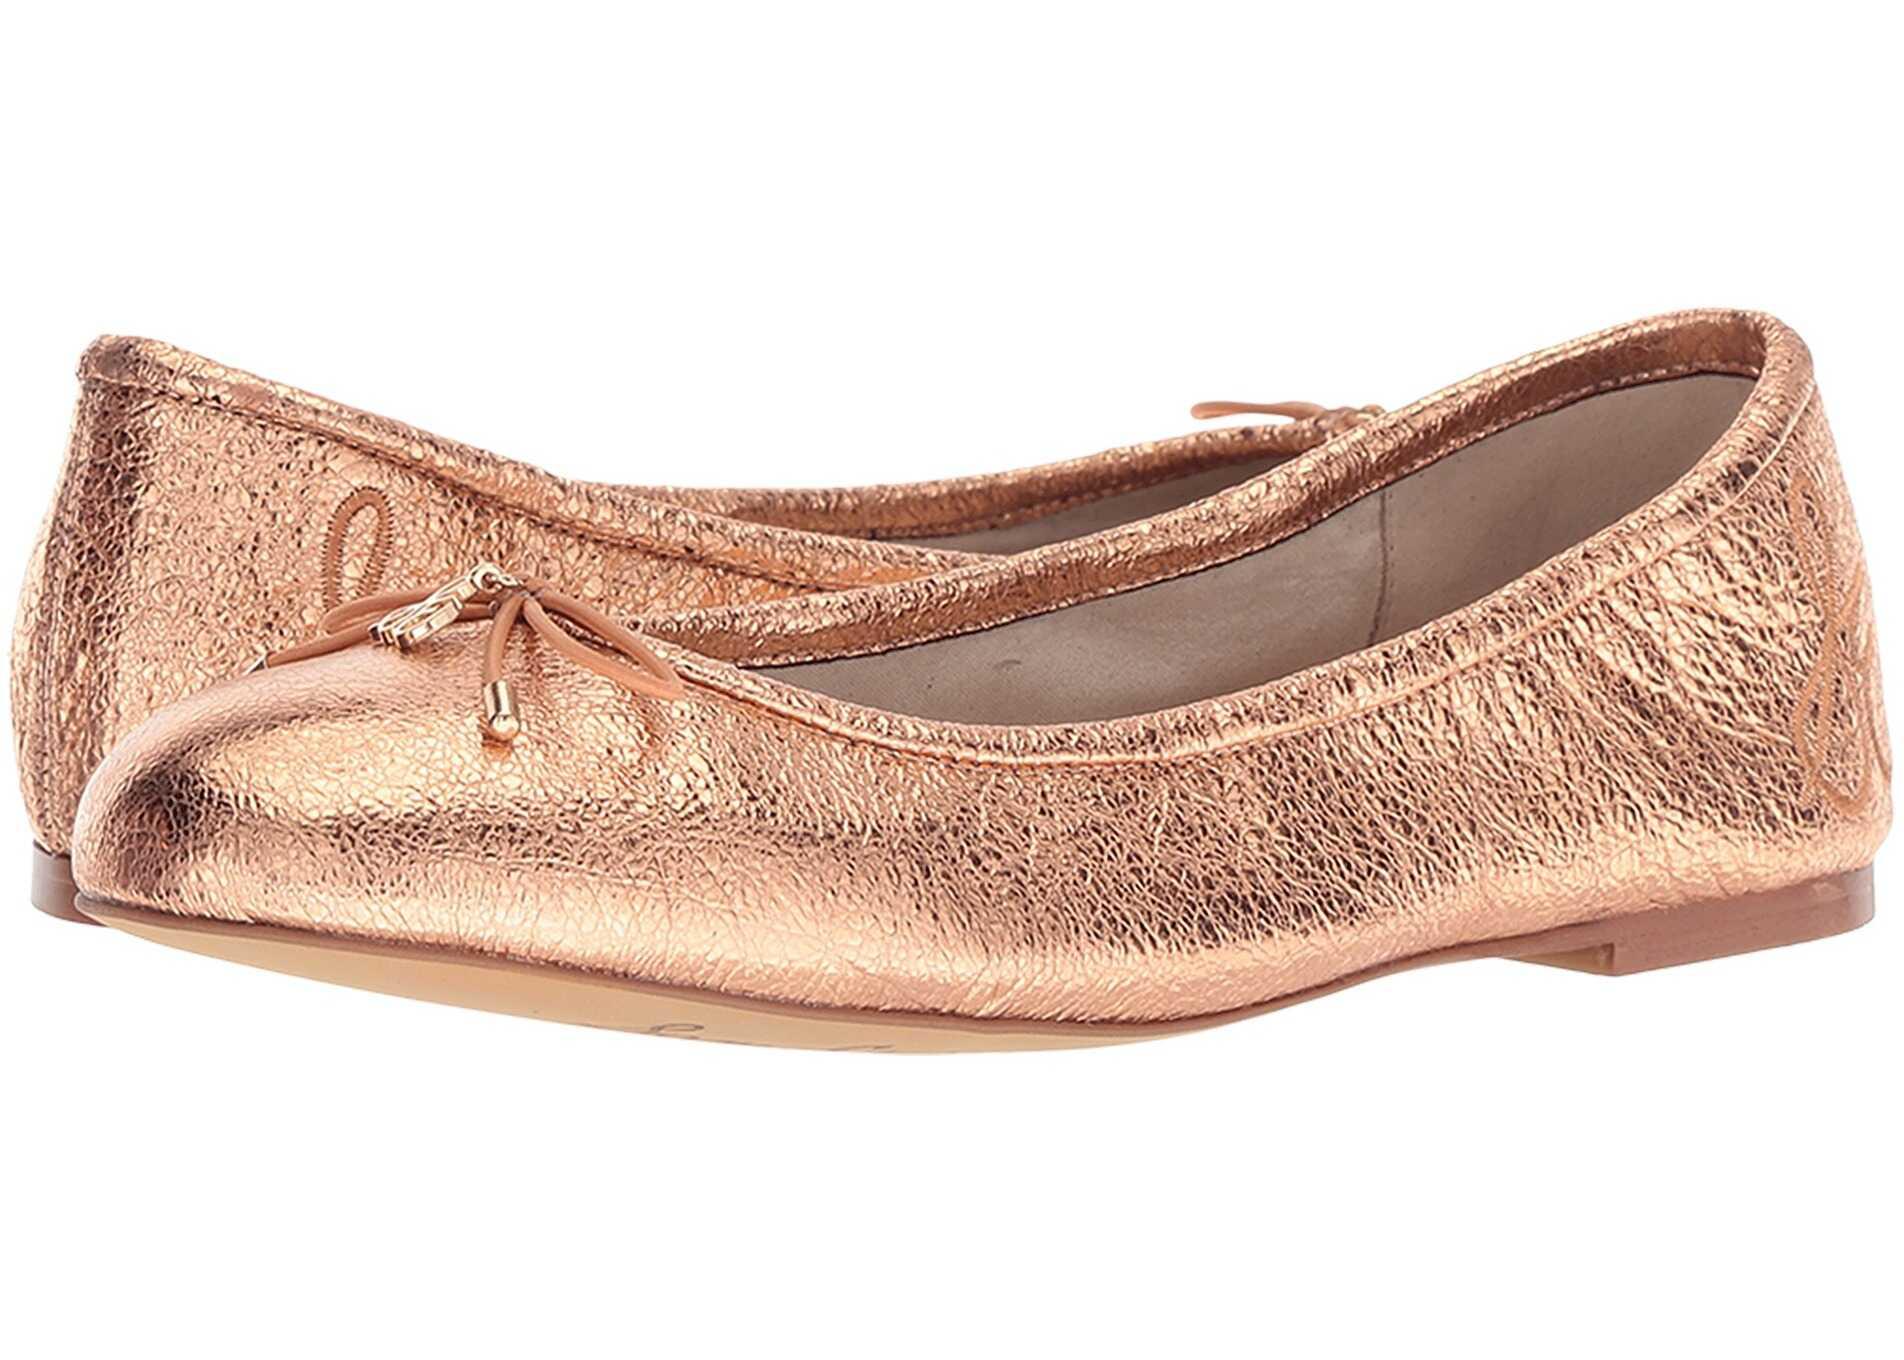 Sam Edelman Felicia Copper Penny Soft Crinkle Metallic Leather